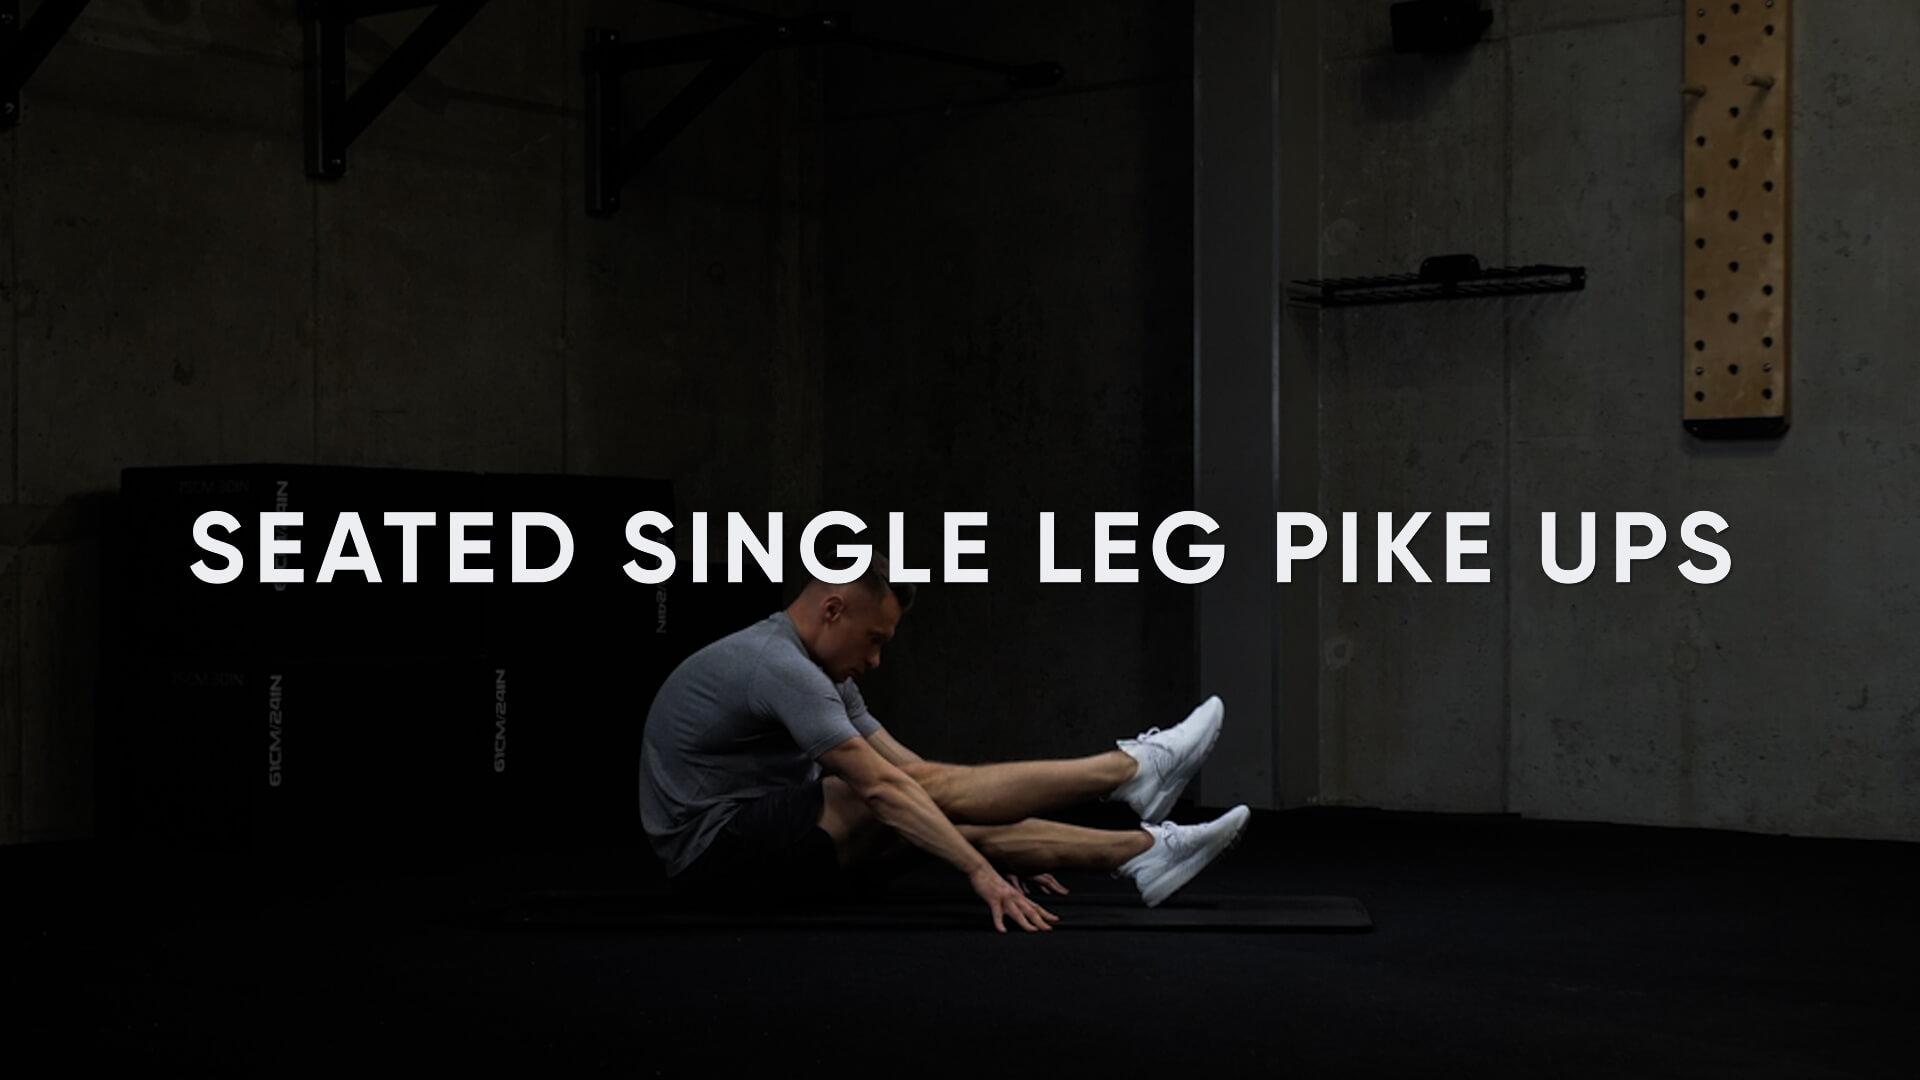 Seated Single Leg Pike Ups